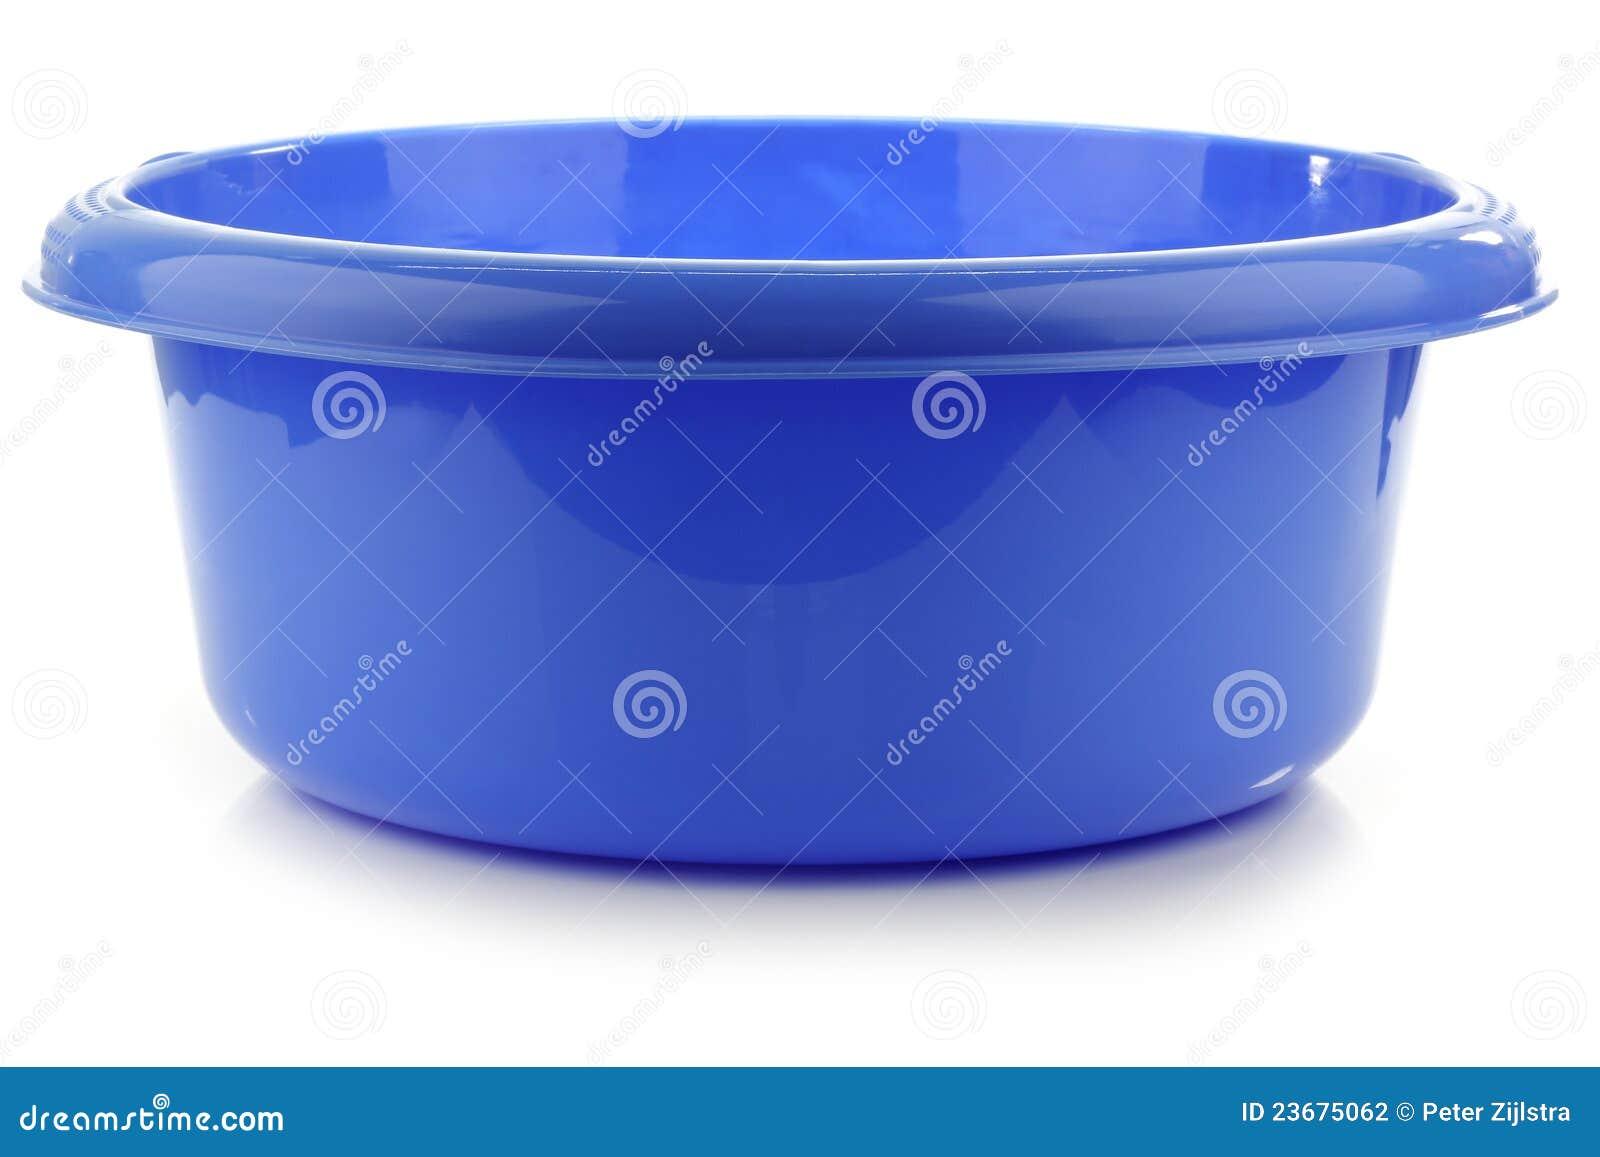 Blauwe Plastic Waskom Stock Fotografie - Afbeelding: 23675062